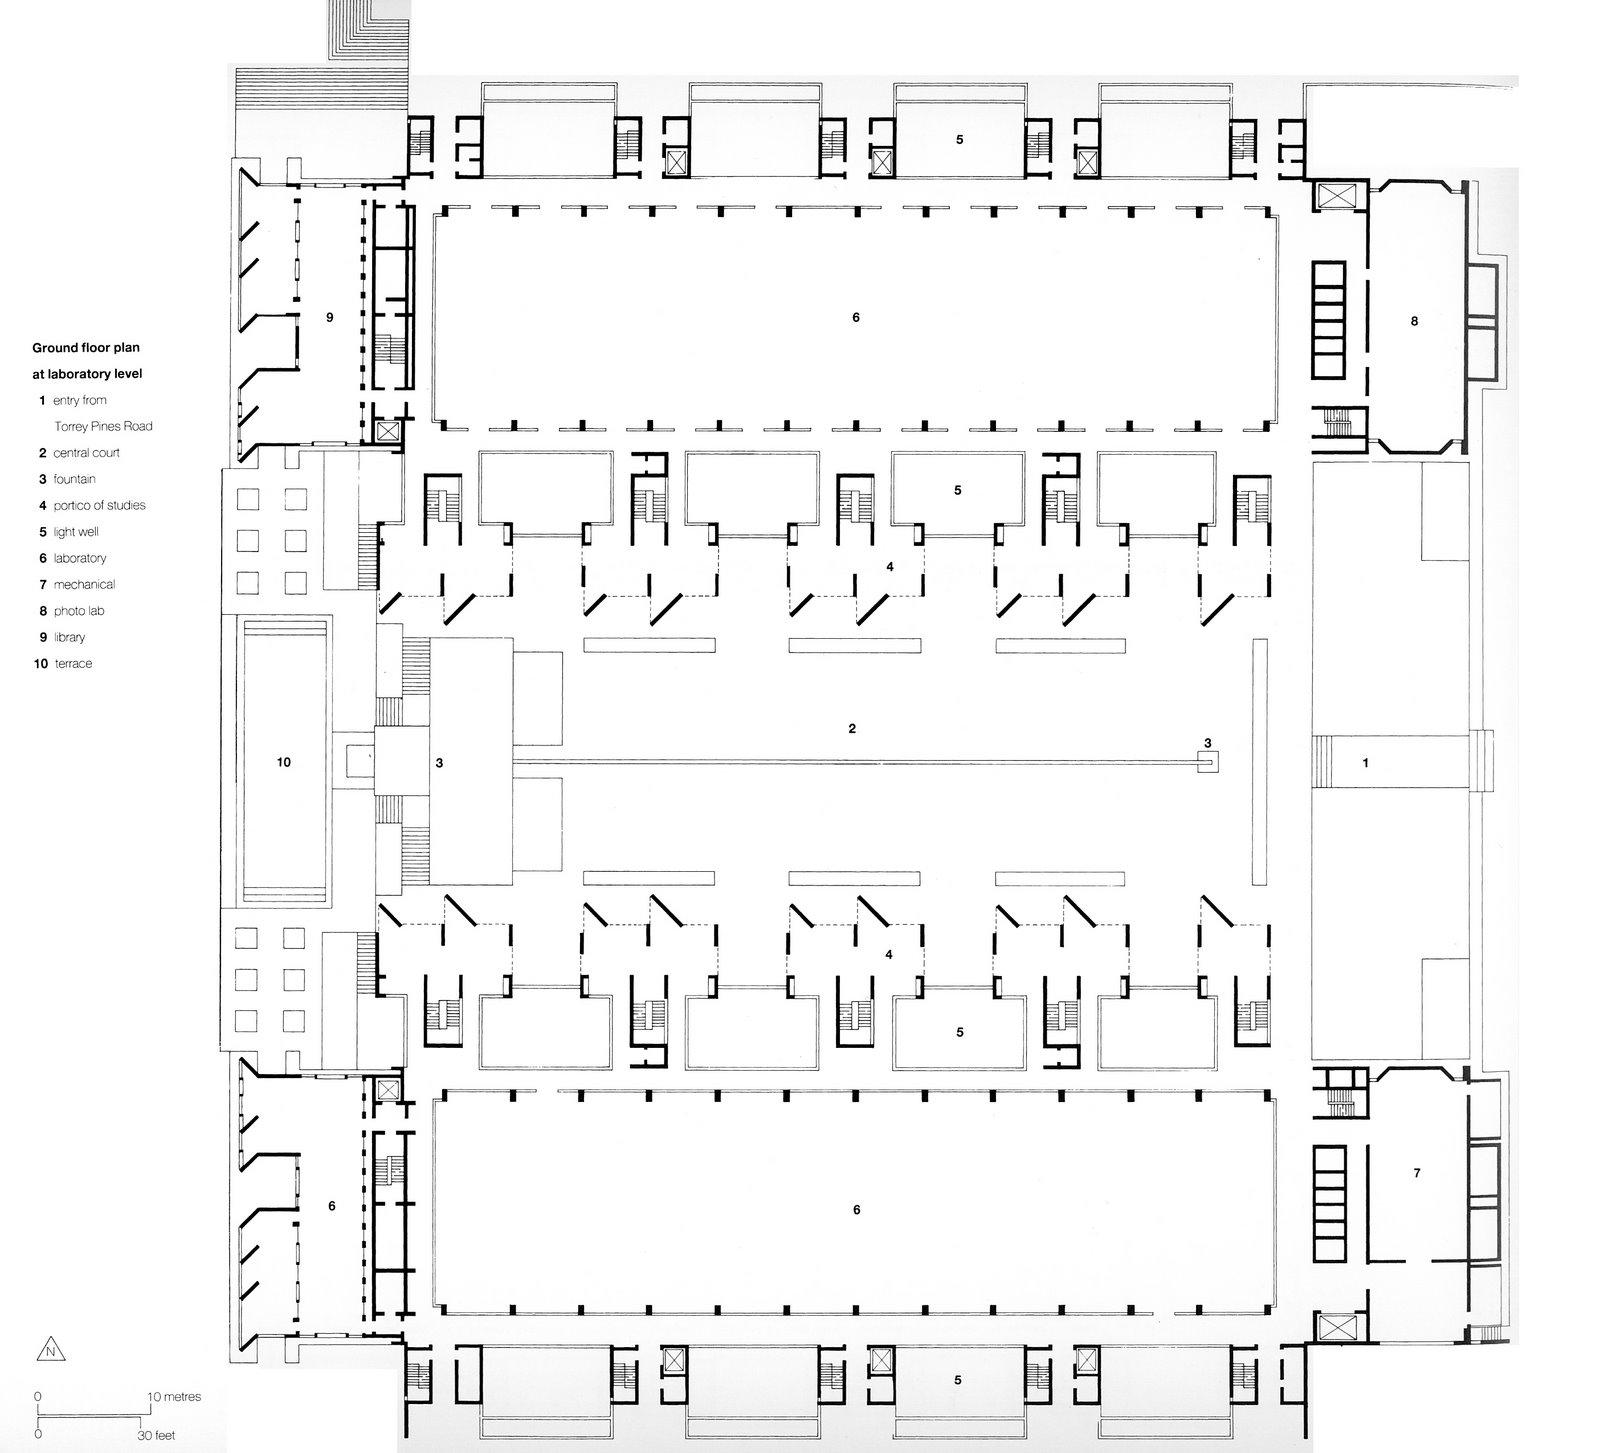 storia dell architettura del 900 1960 1969 salk institute for biological studies salk institute